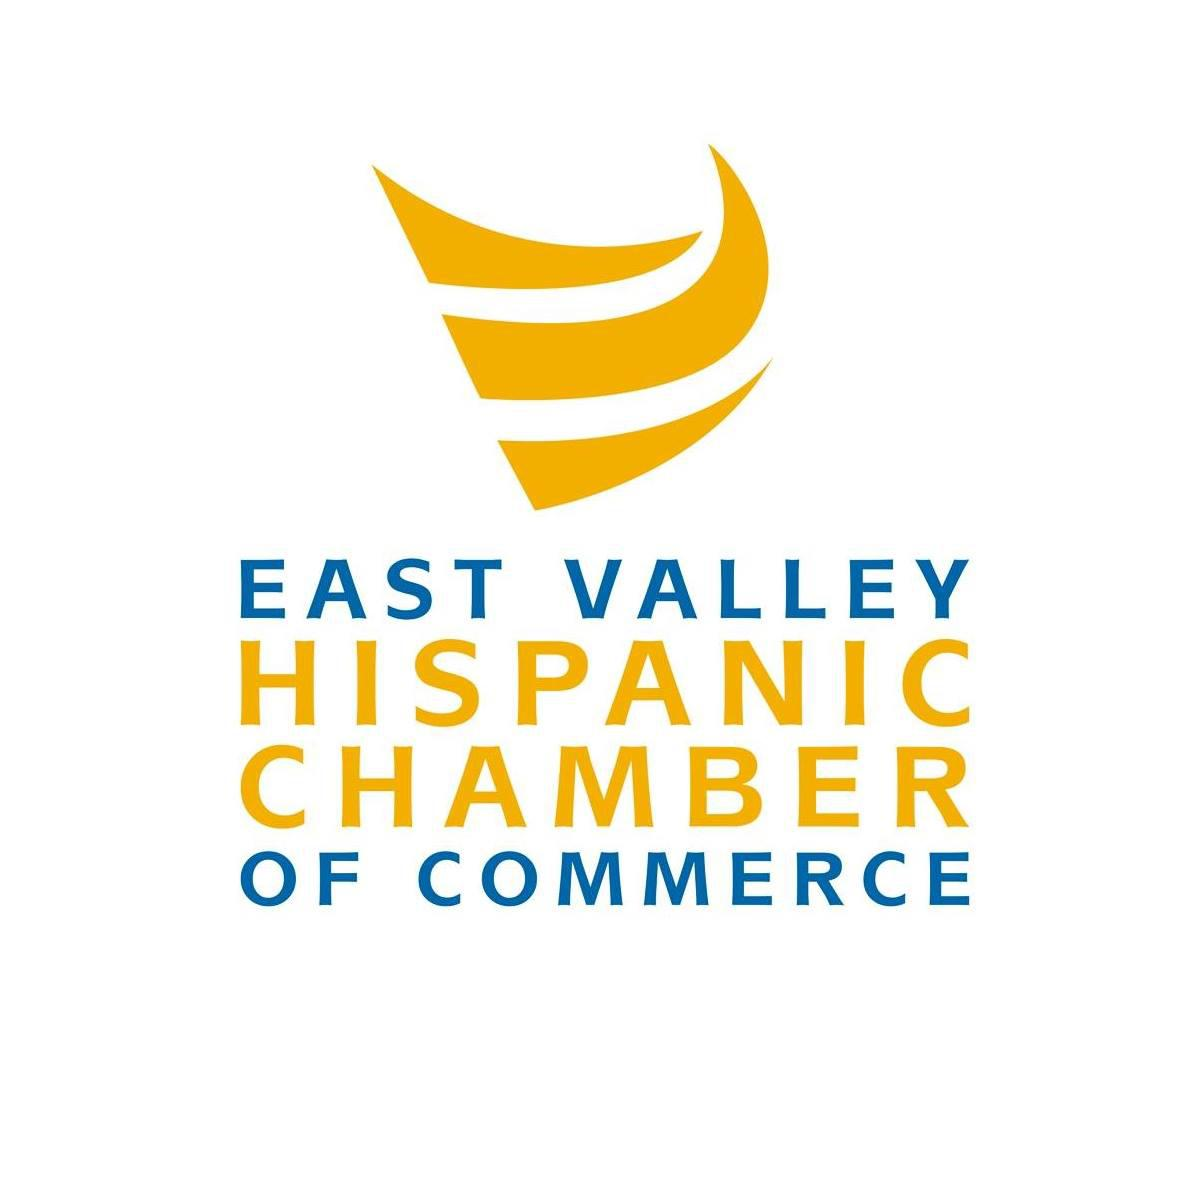 East Valley Hispanic Chamber of Commerce